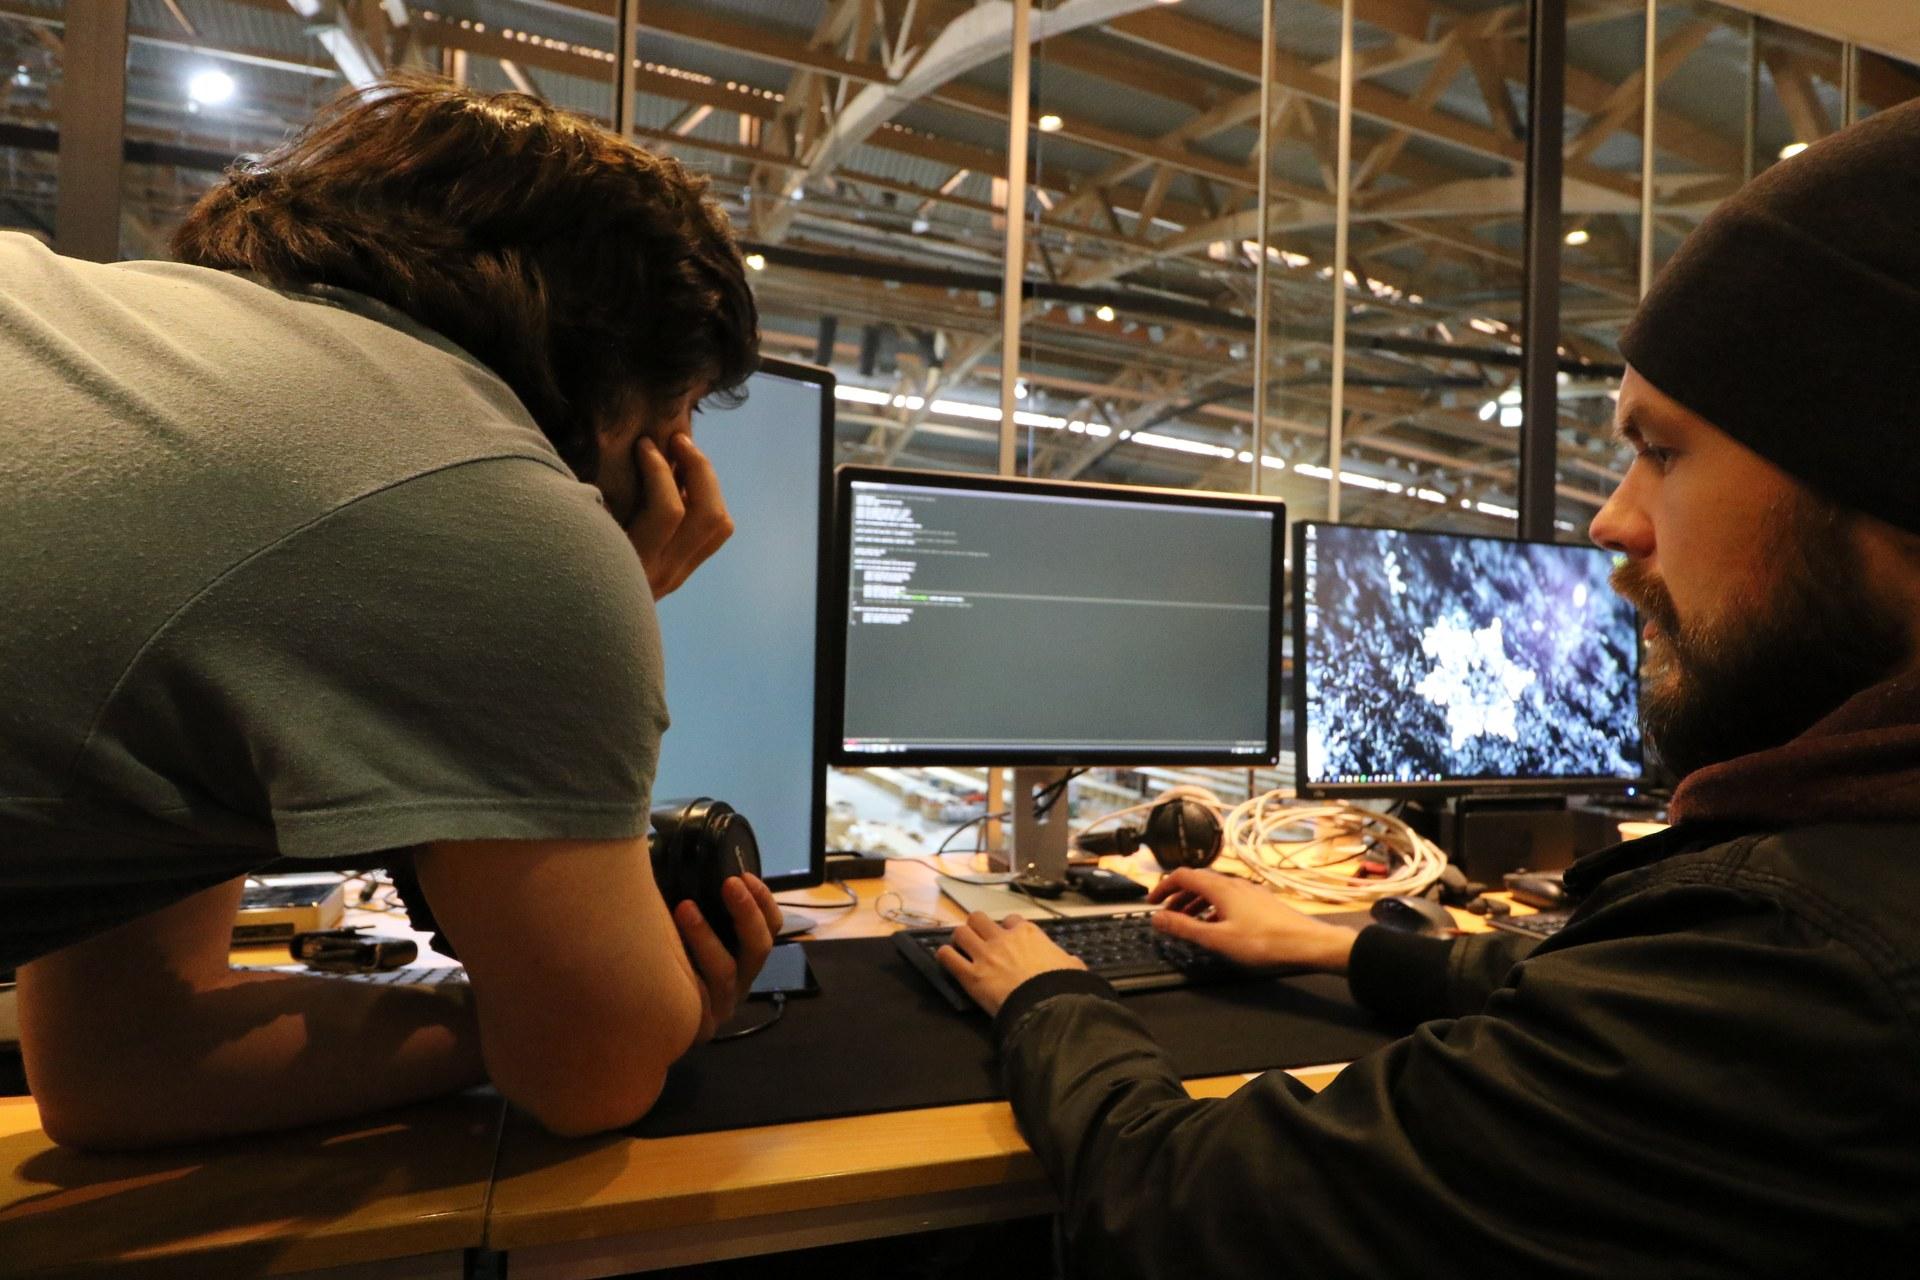 Jocke and Lasse hard at work